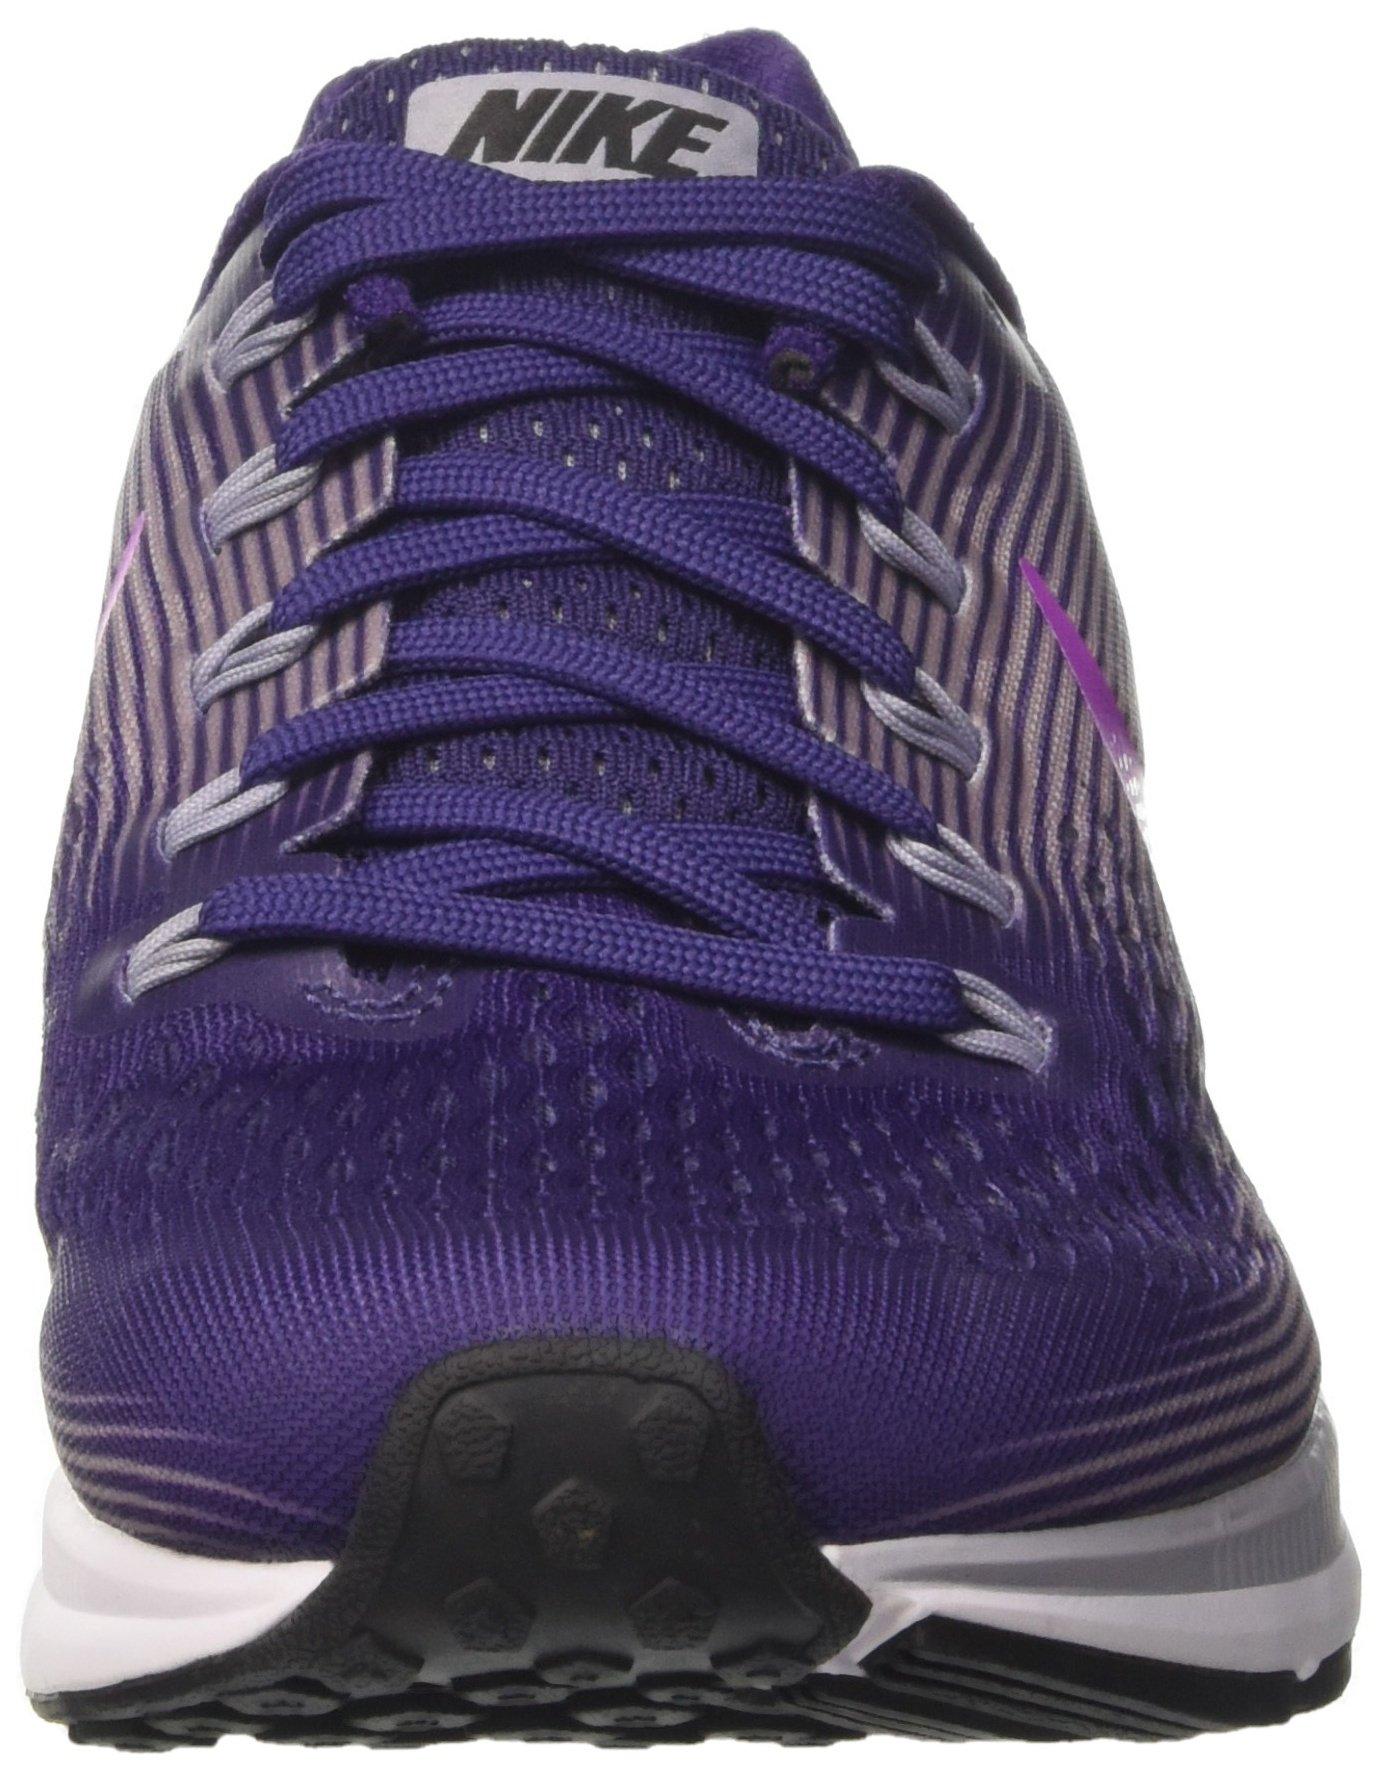 Nike Women's Air Zoom Pegasus 34 Running Shoes-Ink/Hyper Violet-6 by Nike (Image #4)